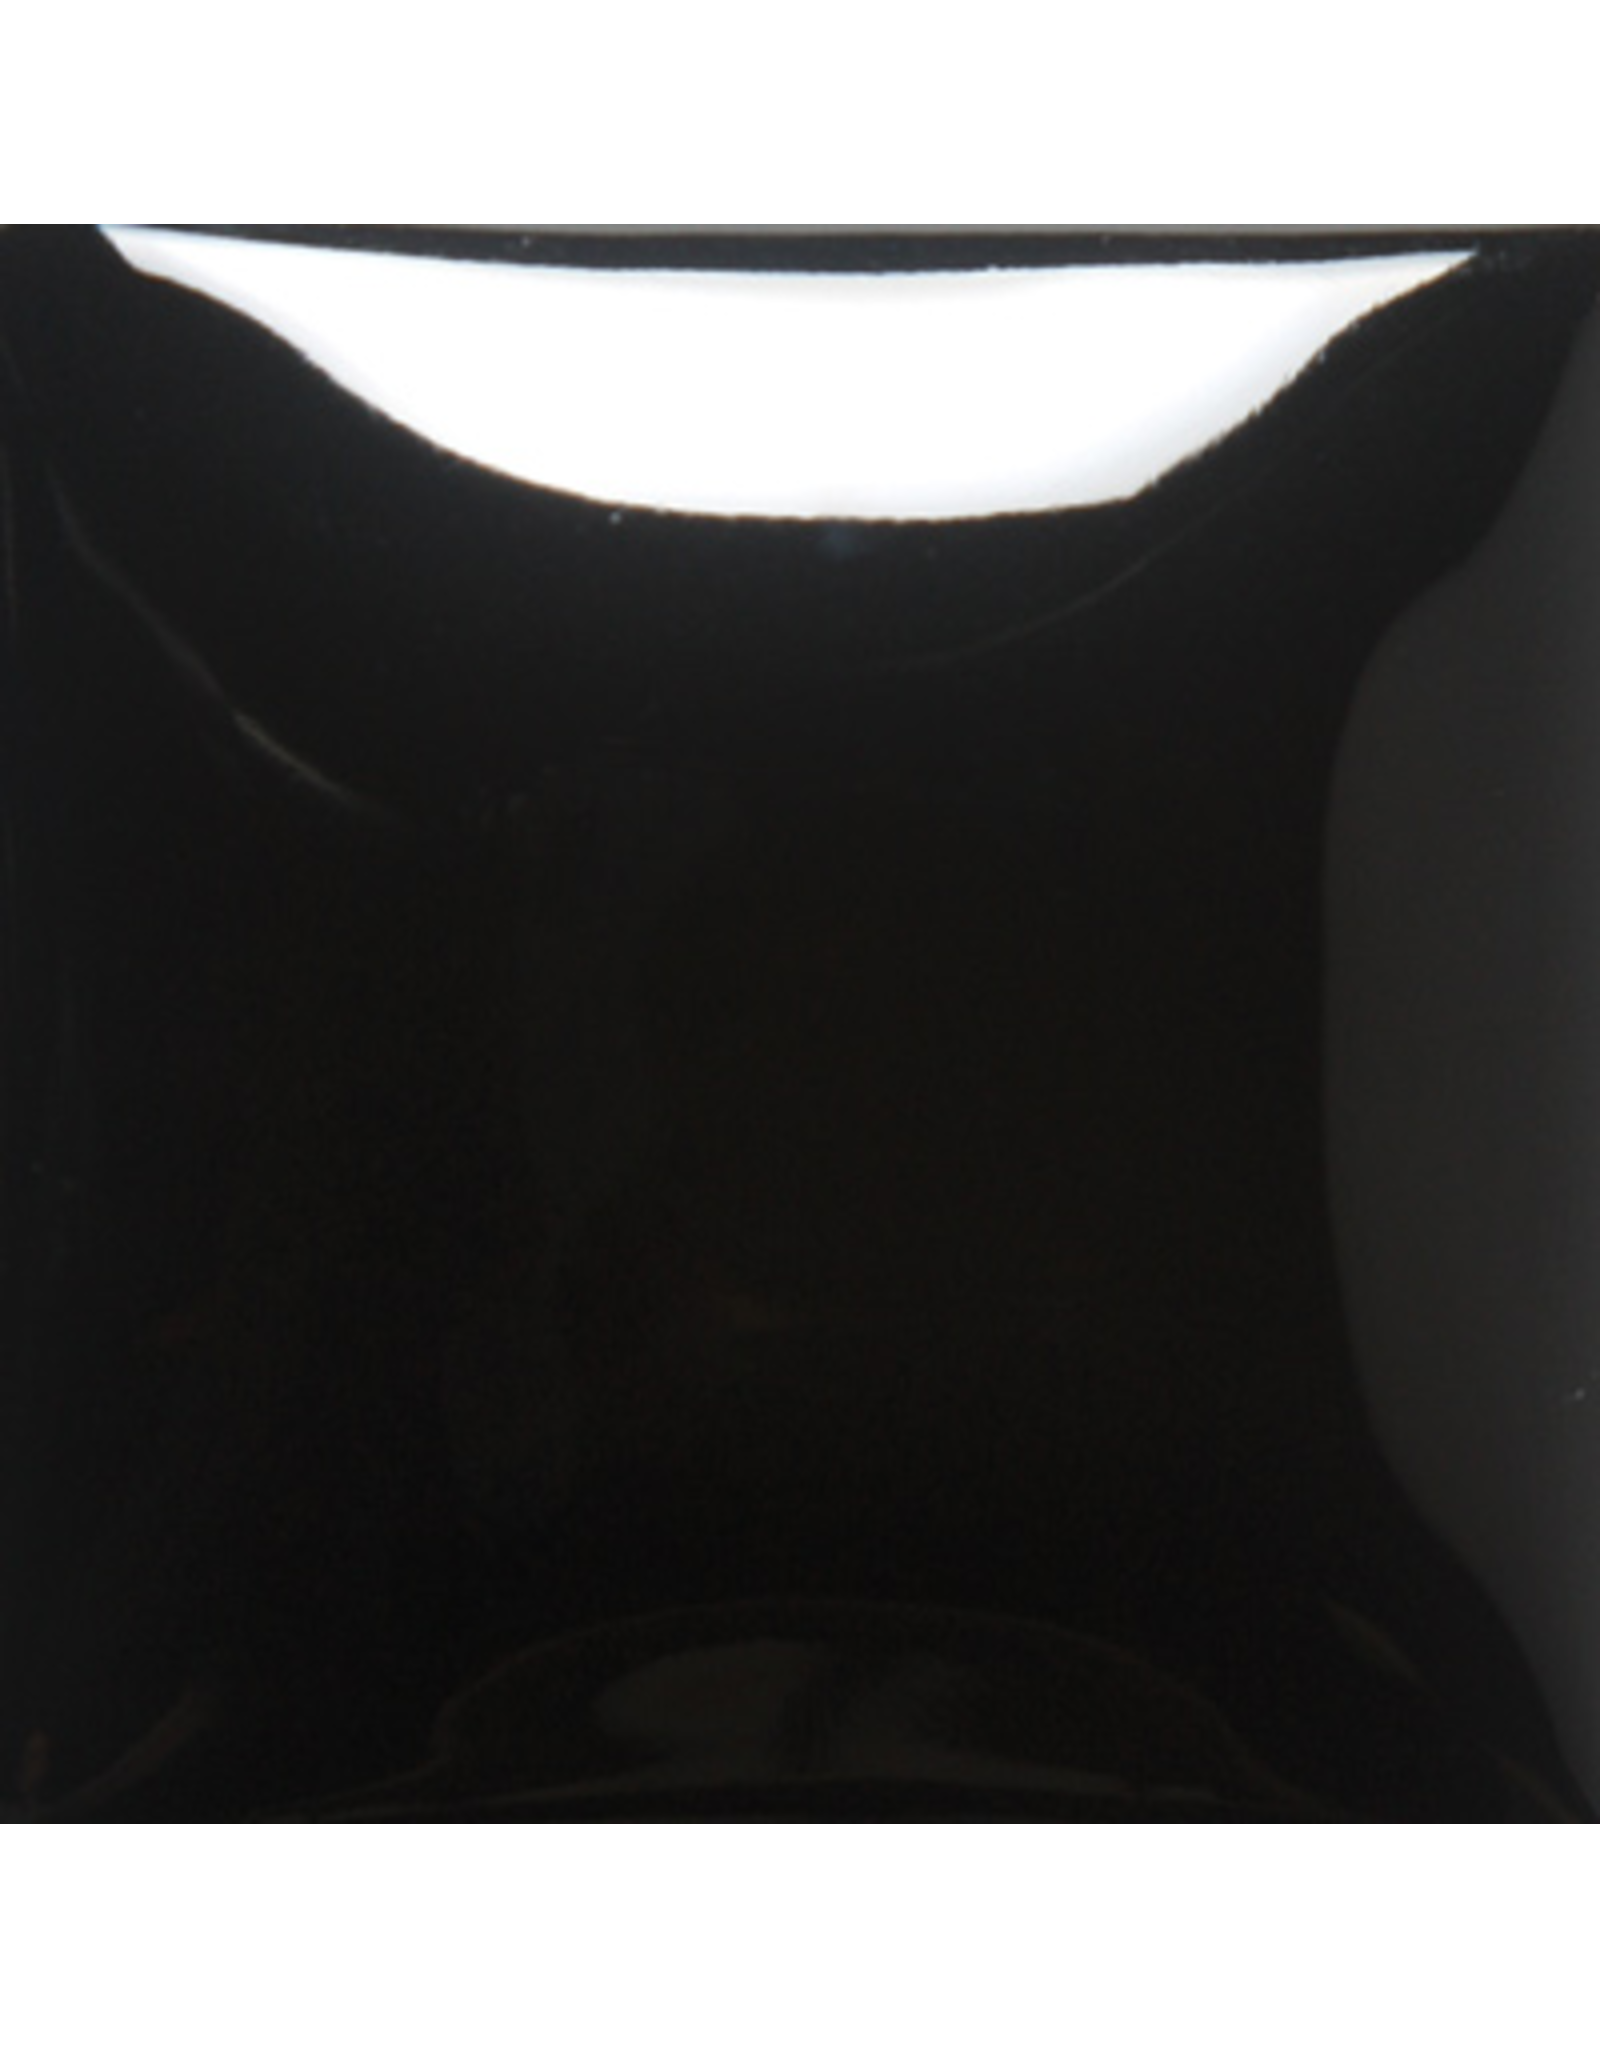 Mayco Black 118ml